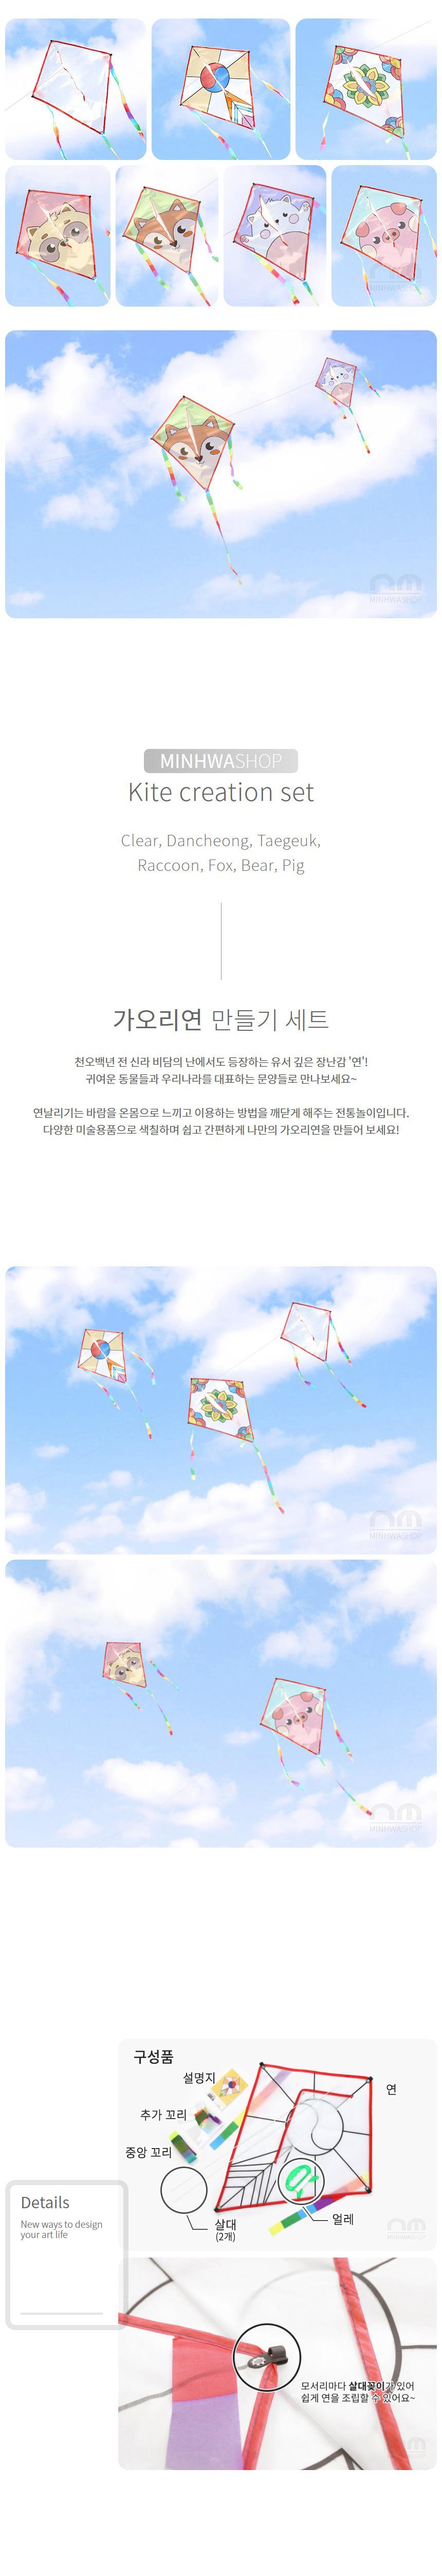 minhwashop_kite_creation_set_01.jpg